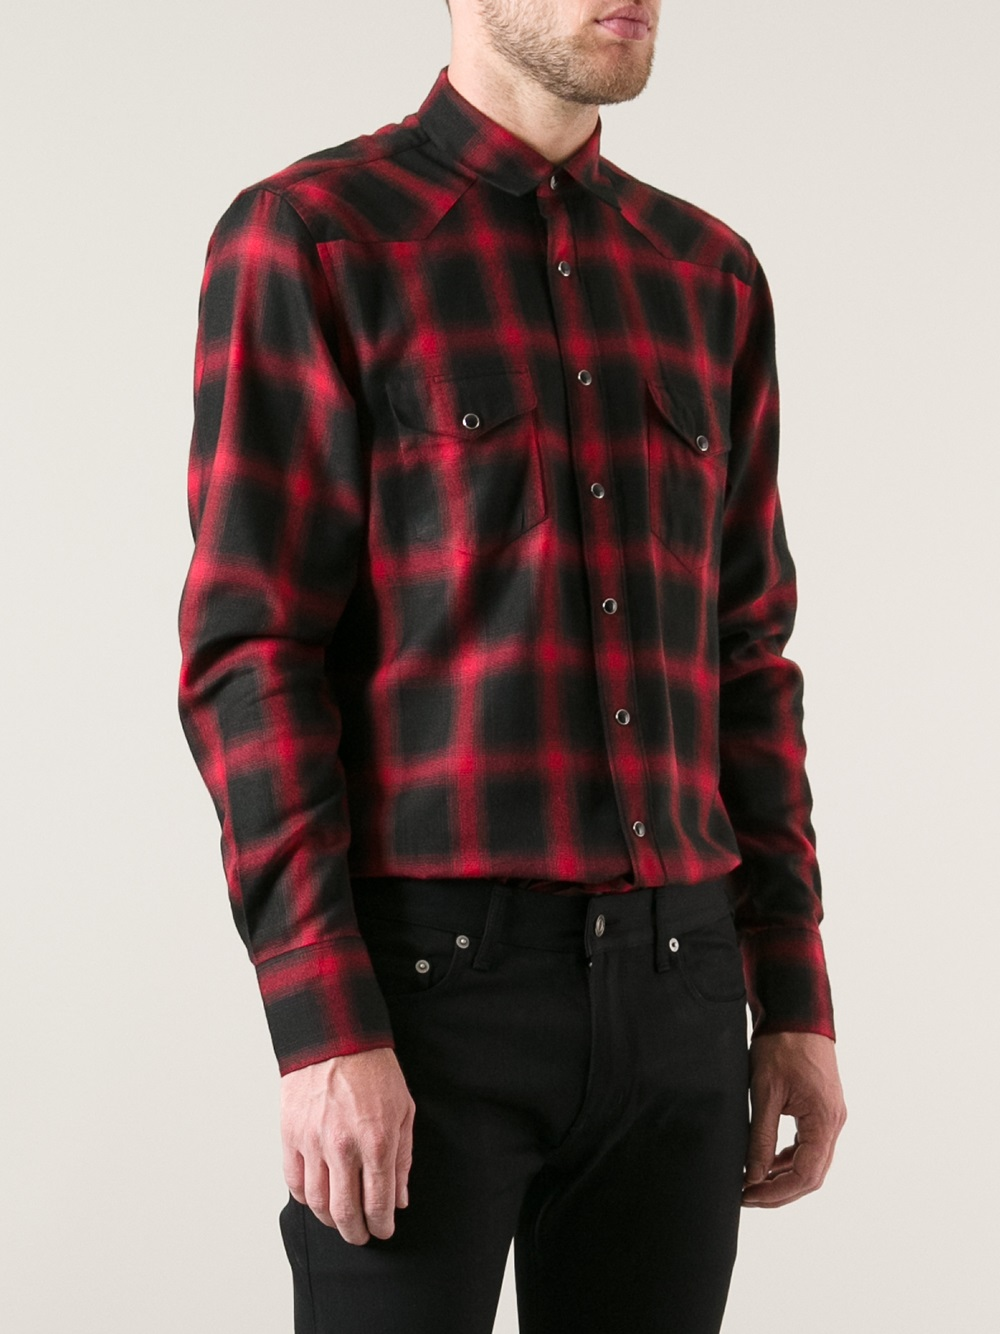 Saint Laurent Plaid Flannel Shirt In Red For Men Lyst